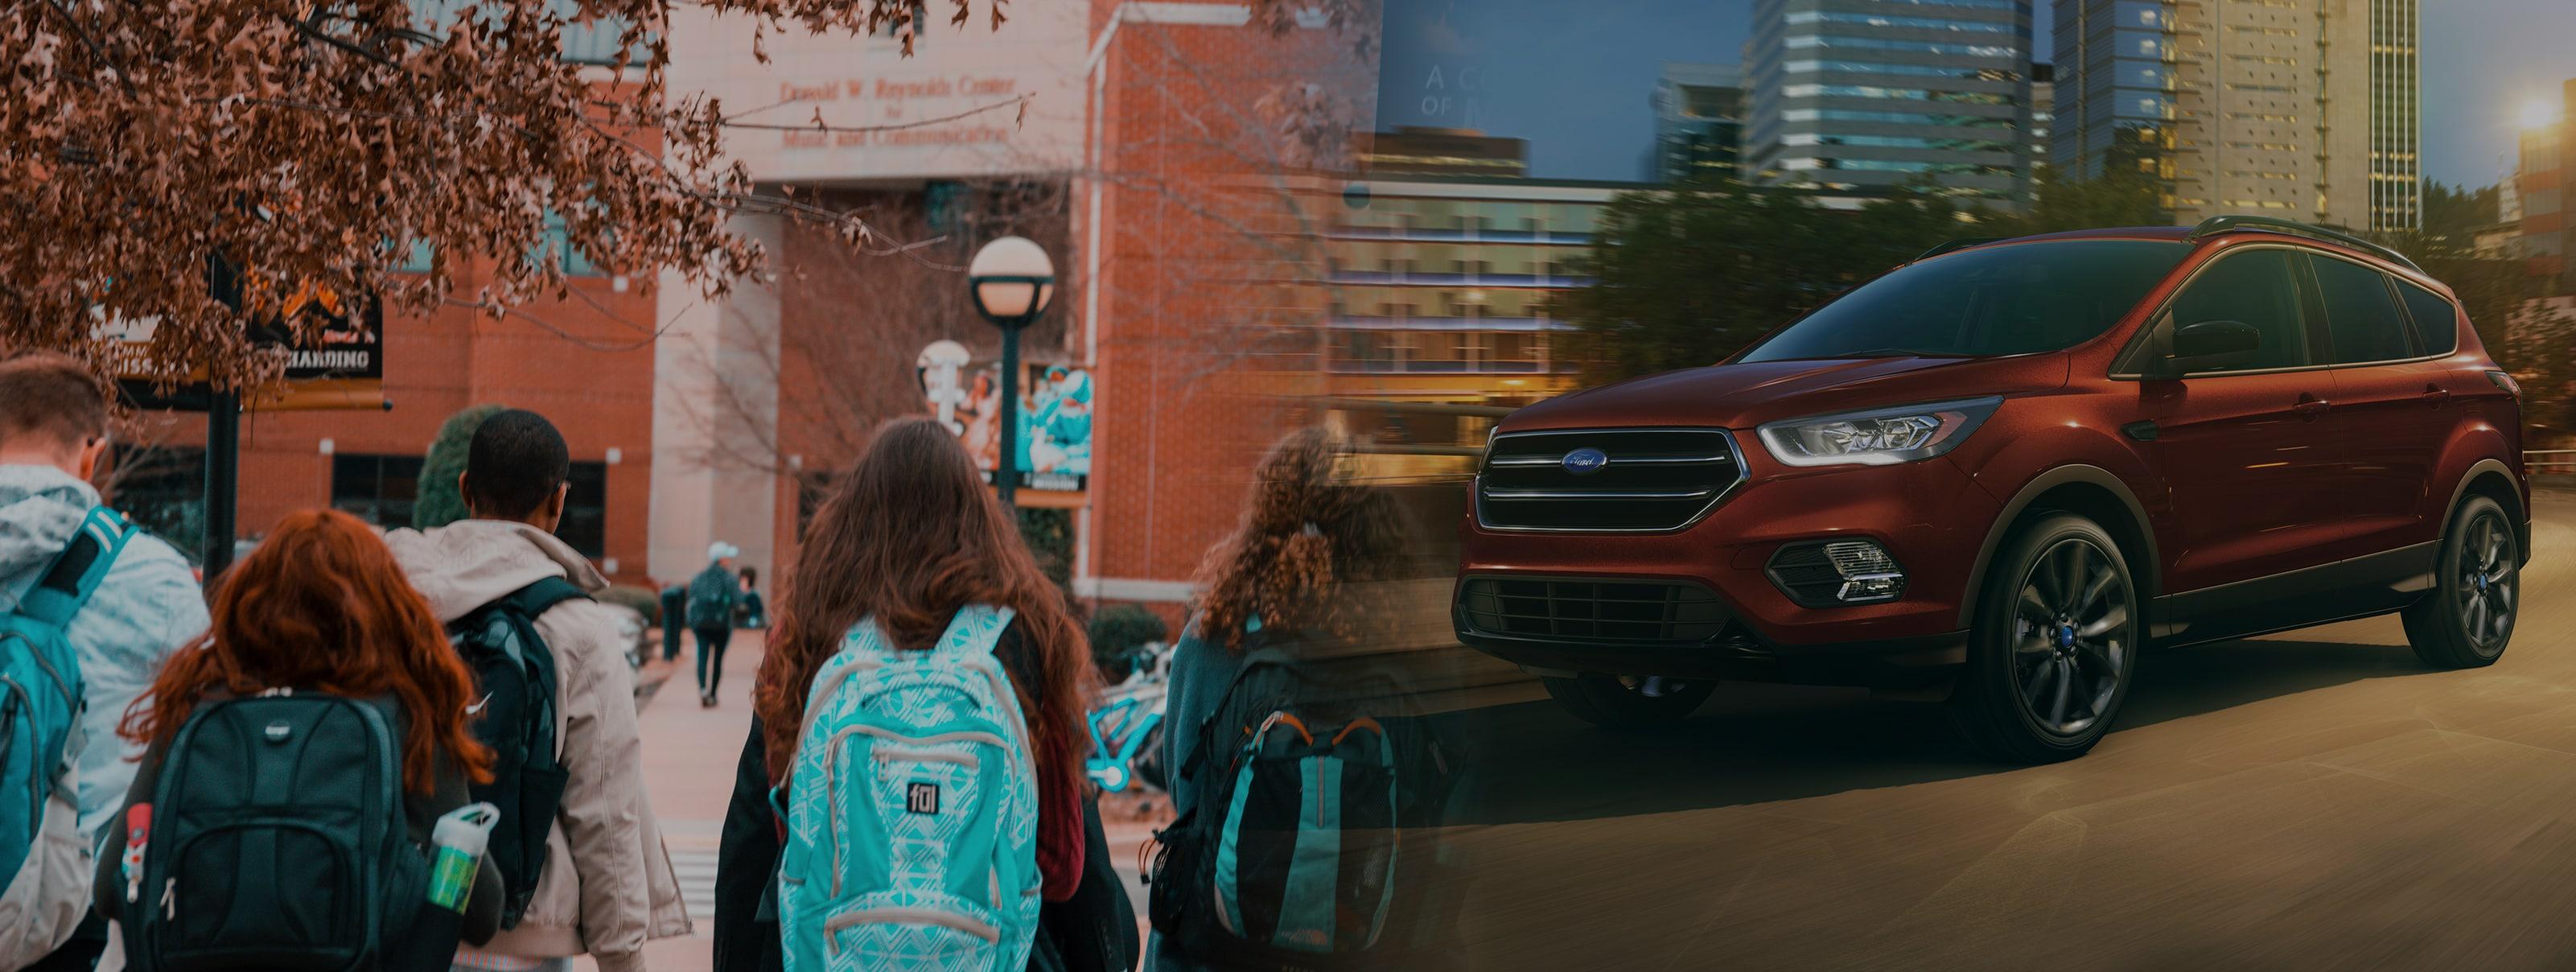 Jc Lewis Ford >> College Discount Jc Lewis Ford Savannah Ford Dealership